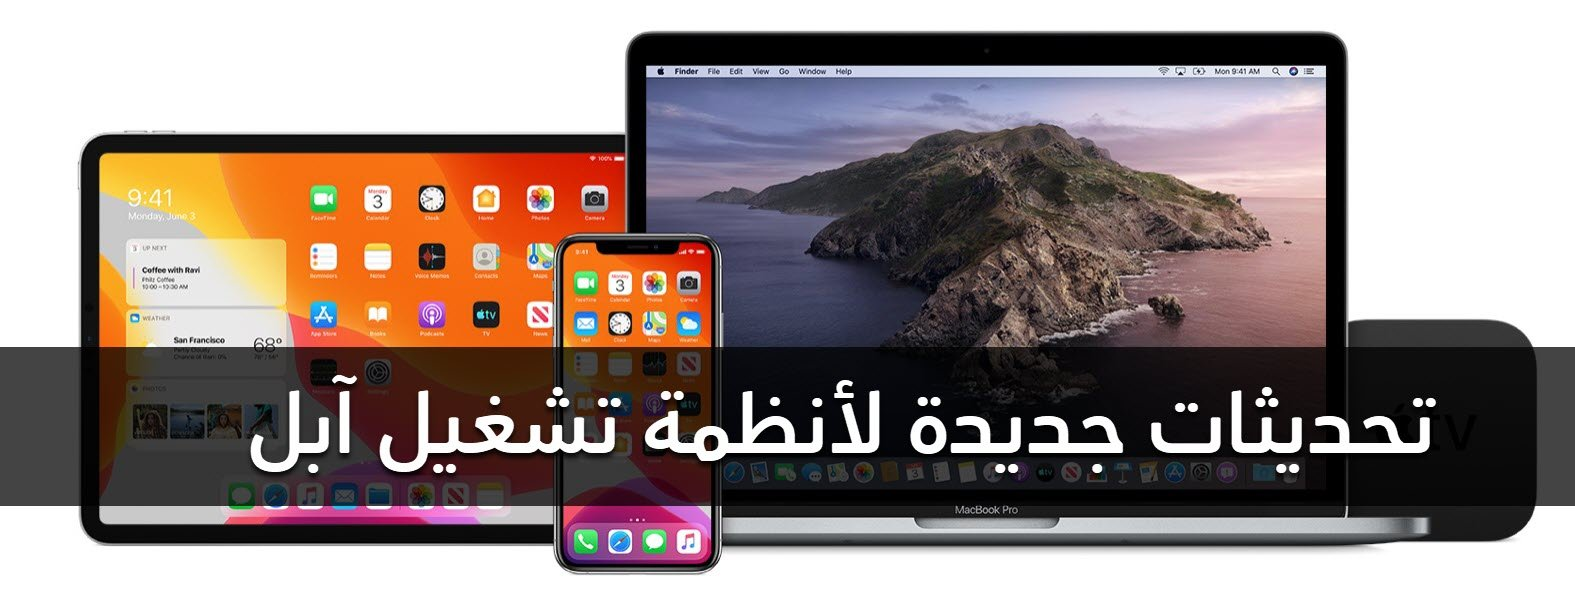 تحديث iOS 13.4